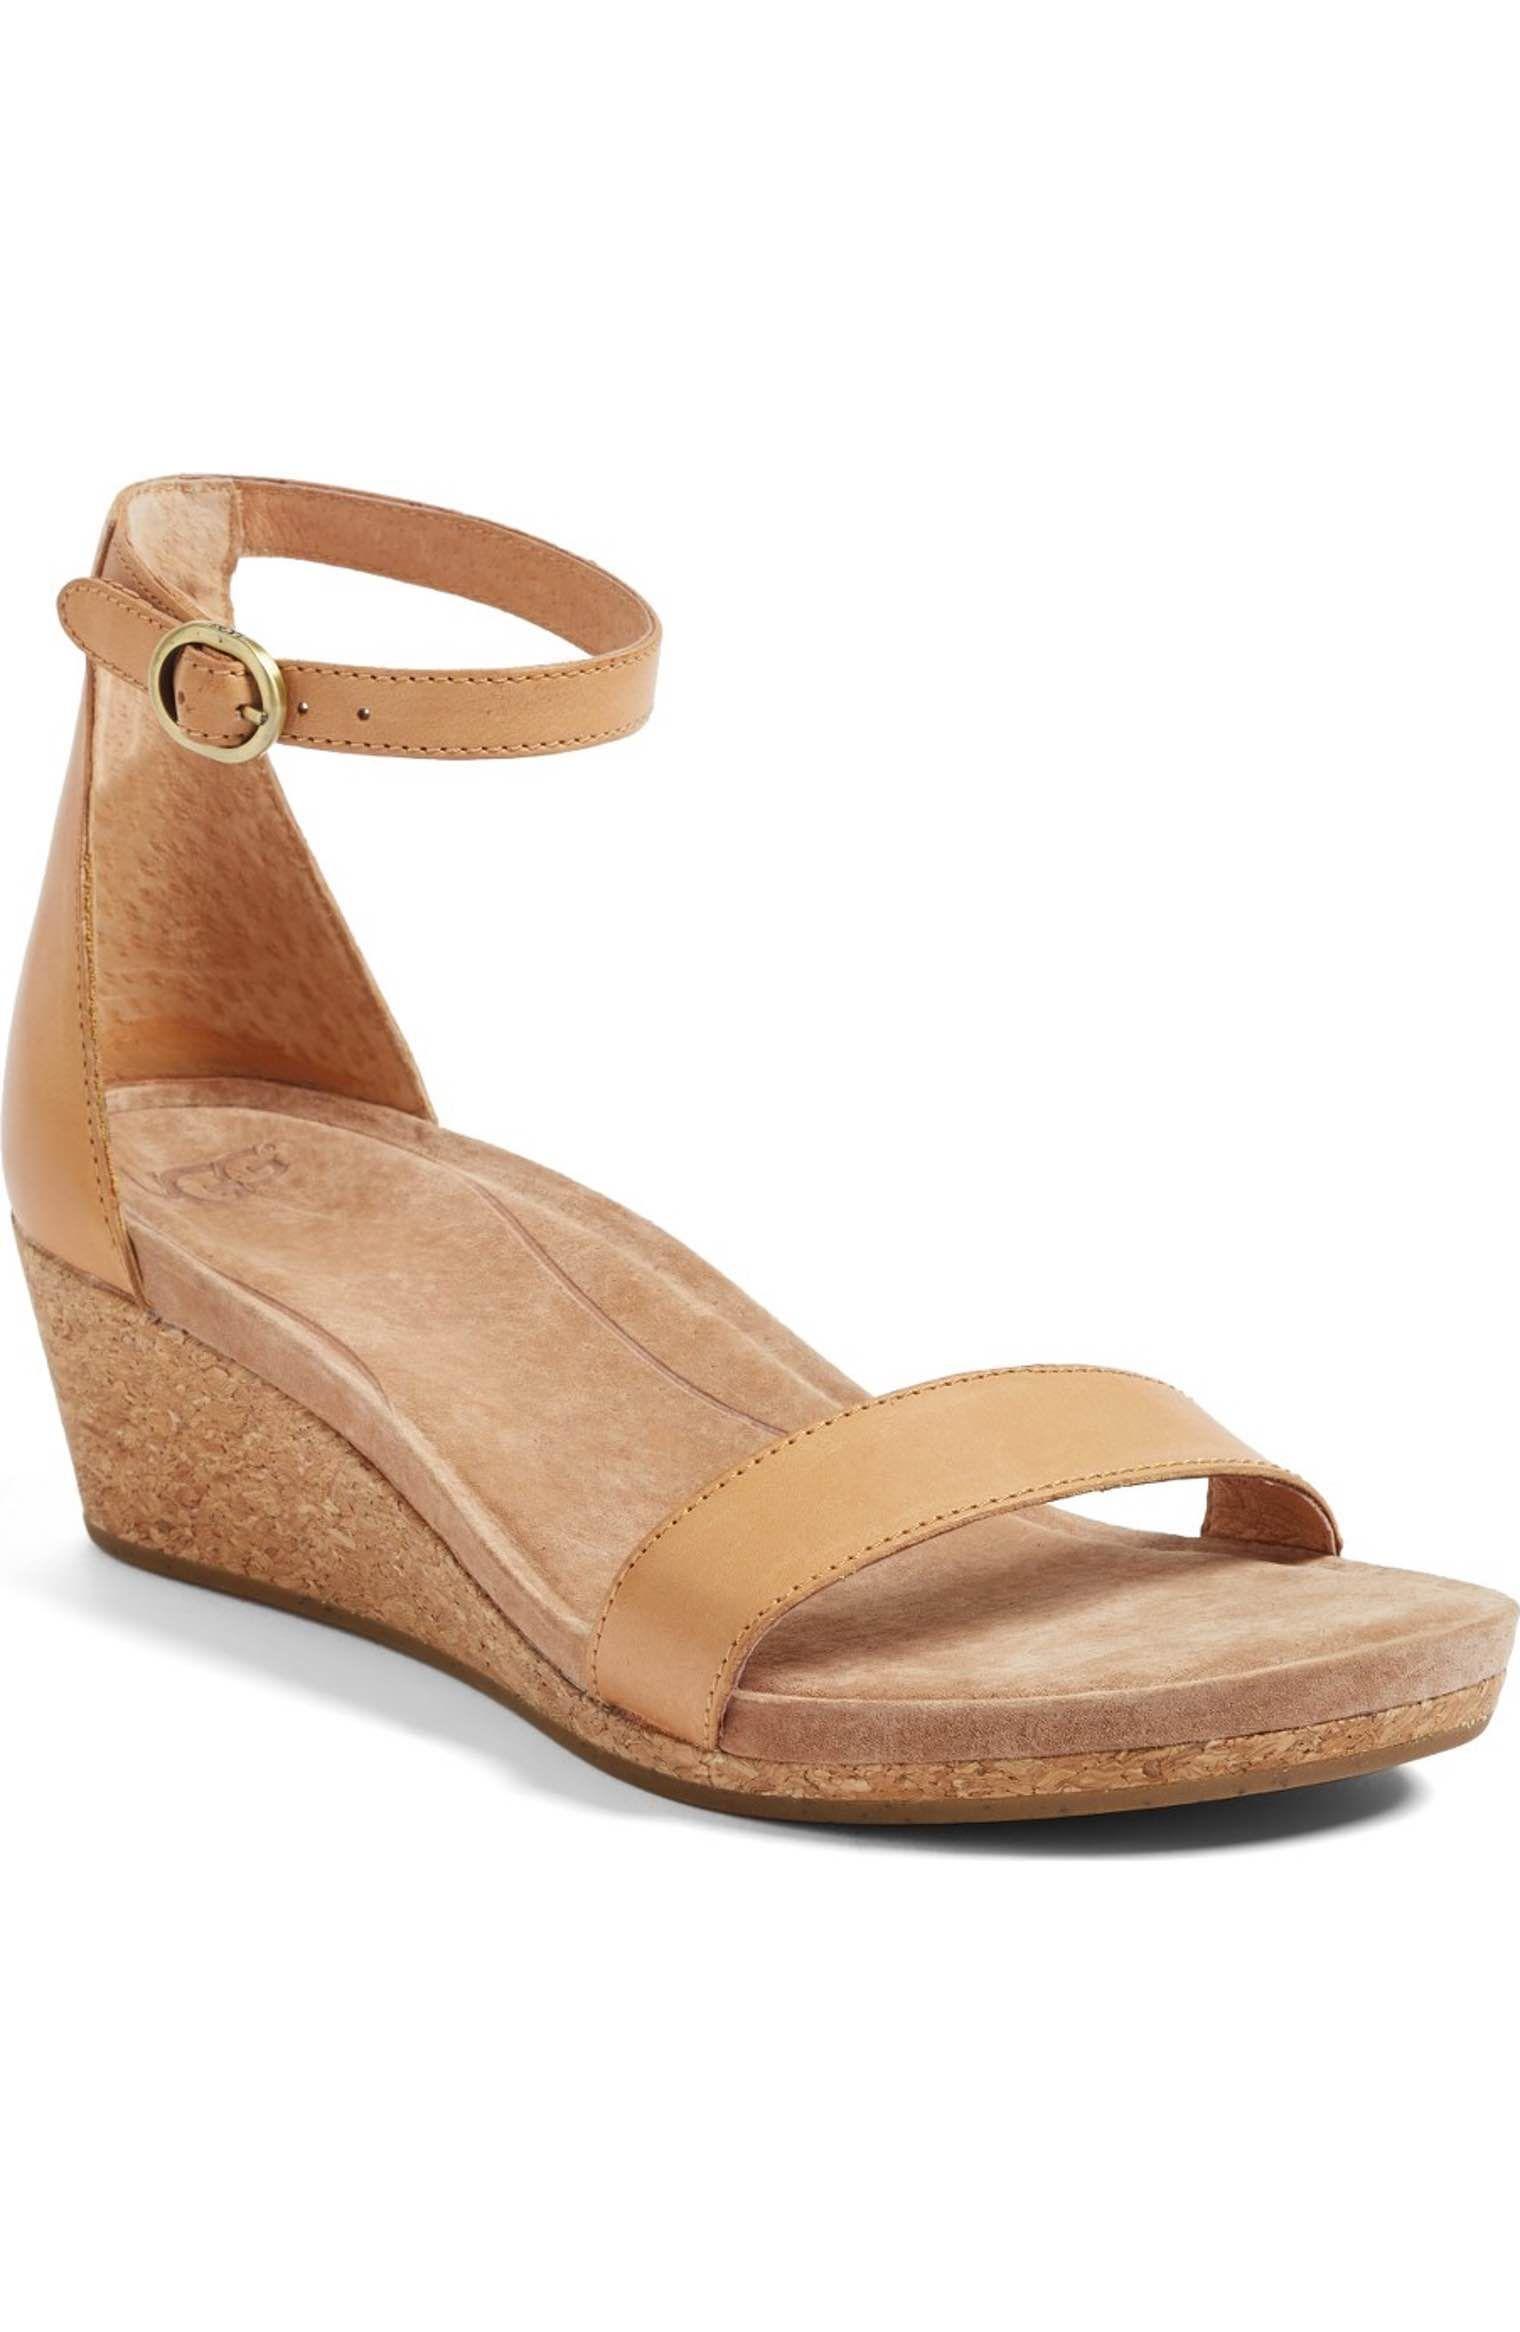 889d98fab74 Main Image - UGG® Emilia Wedge Sandal (Women)